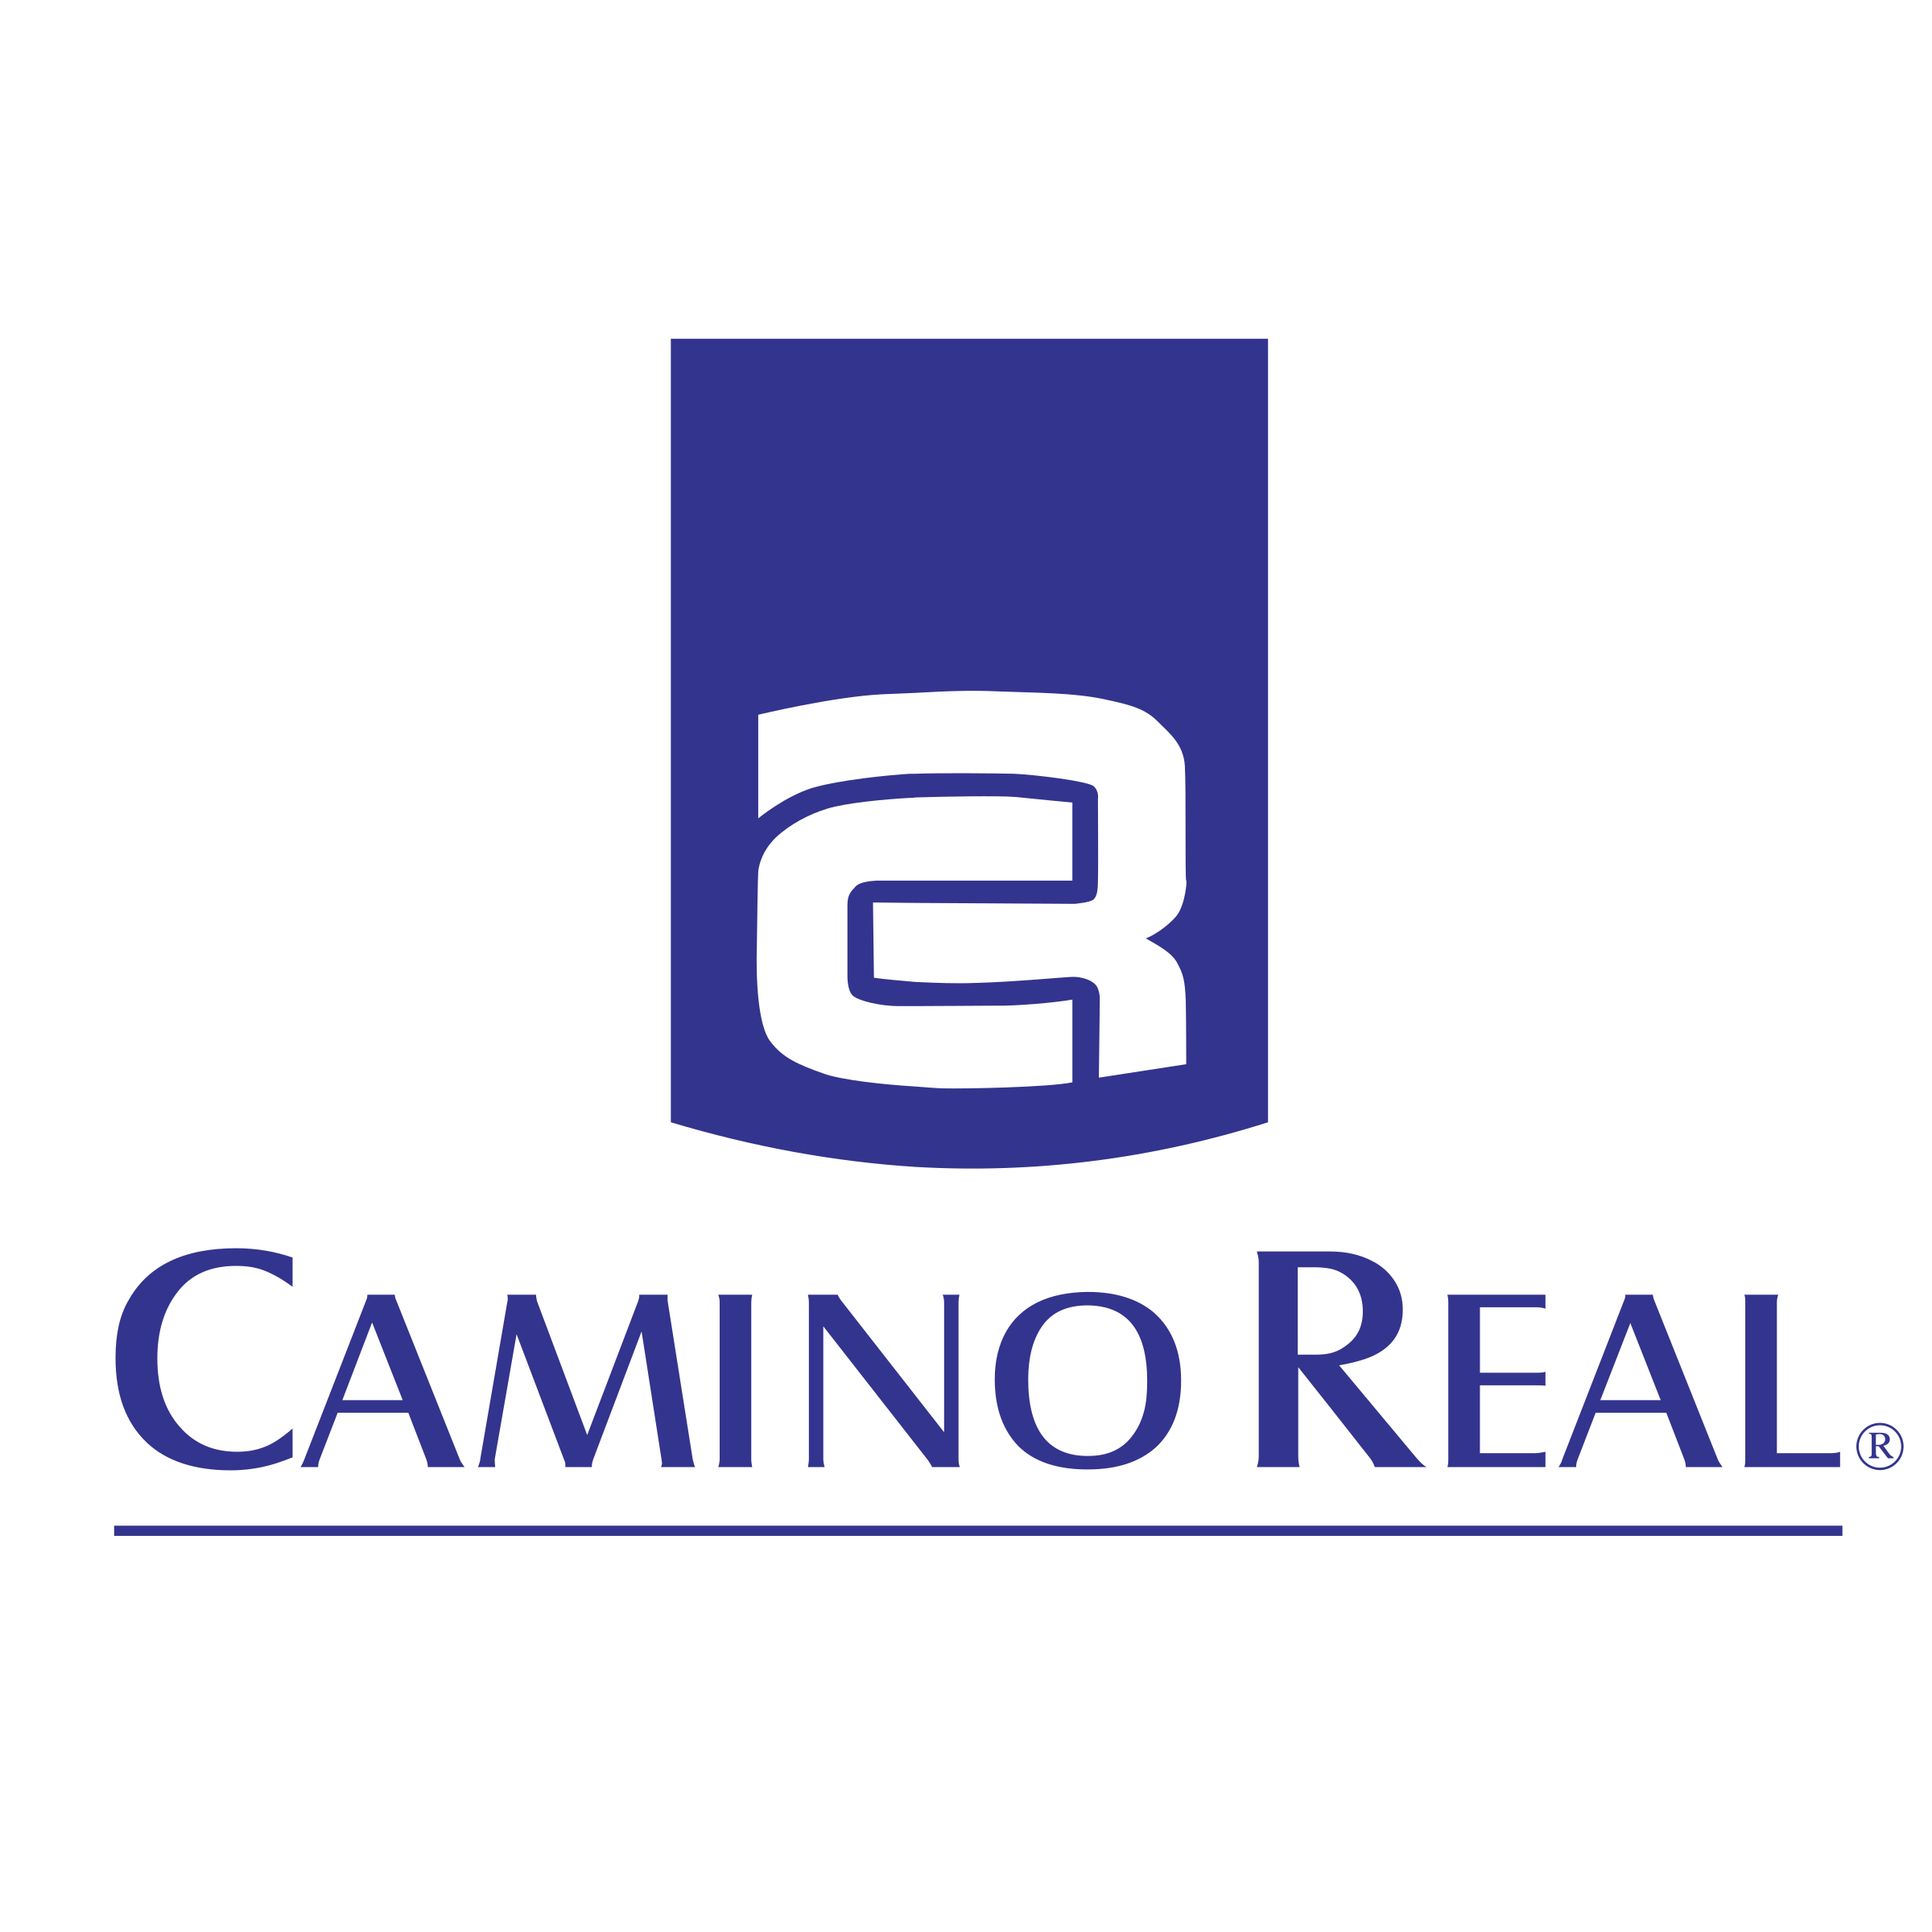 Camino Real logo